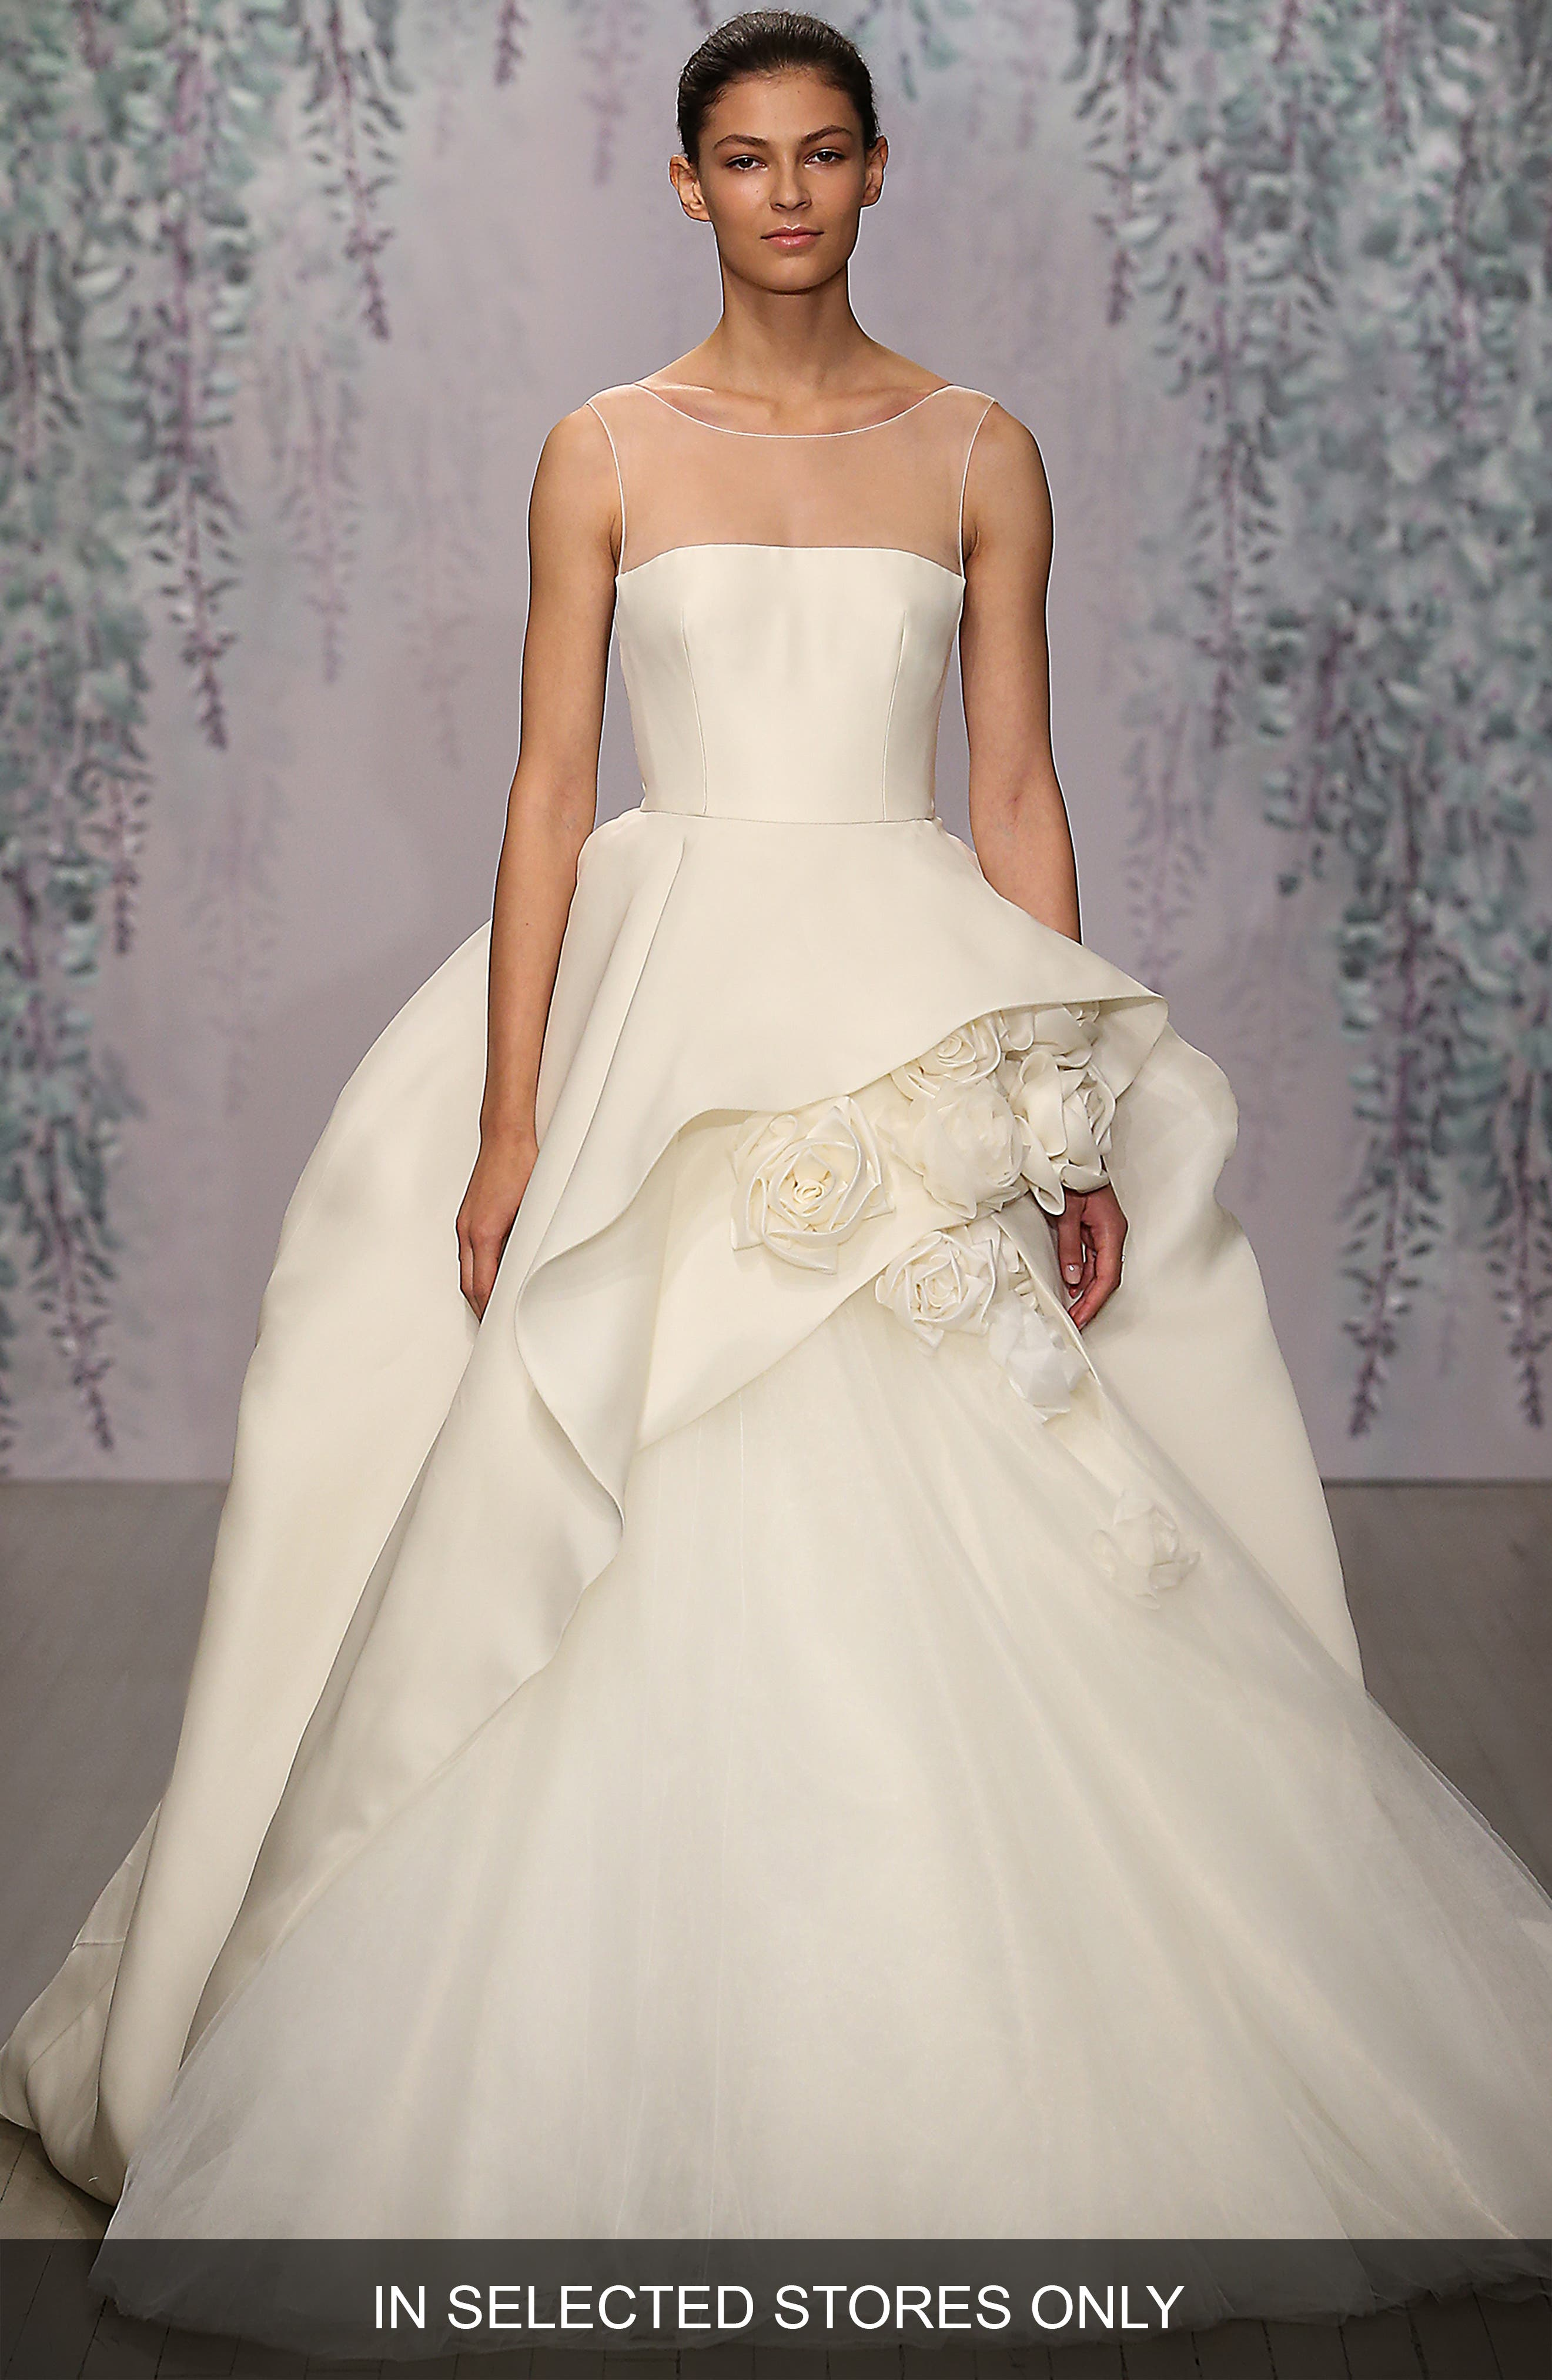 Monique Lhuillier Rosette Detail Silk Ballgown Dress (In Stores Only)